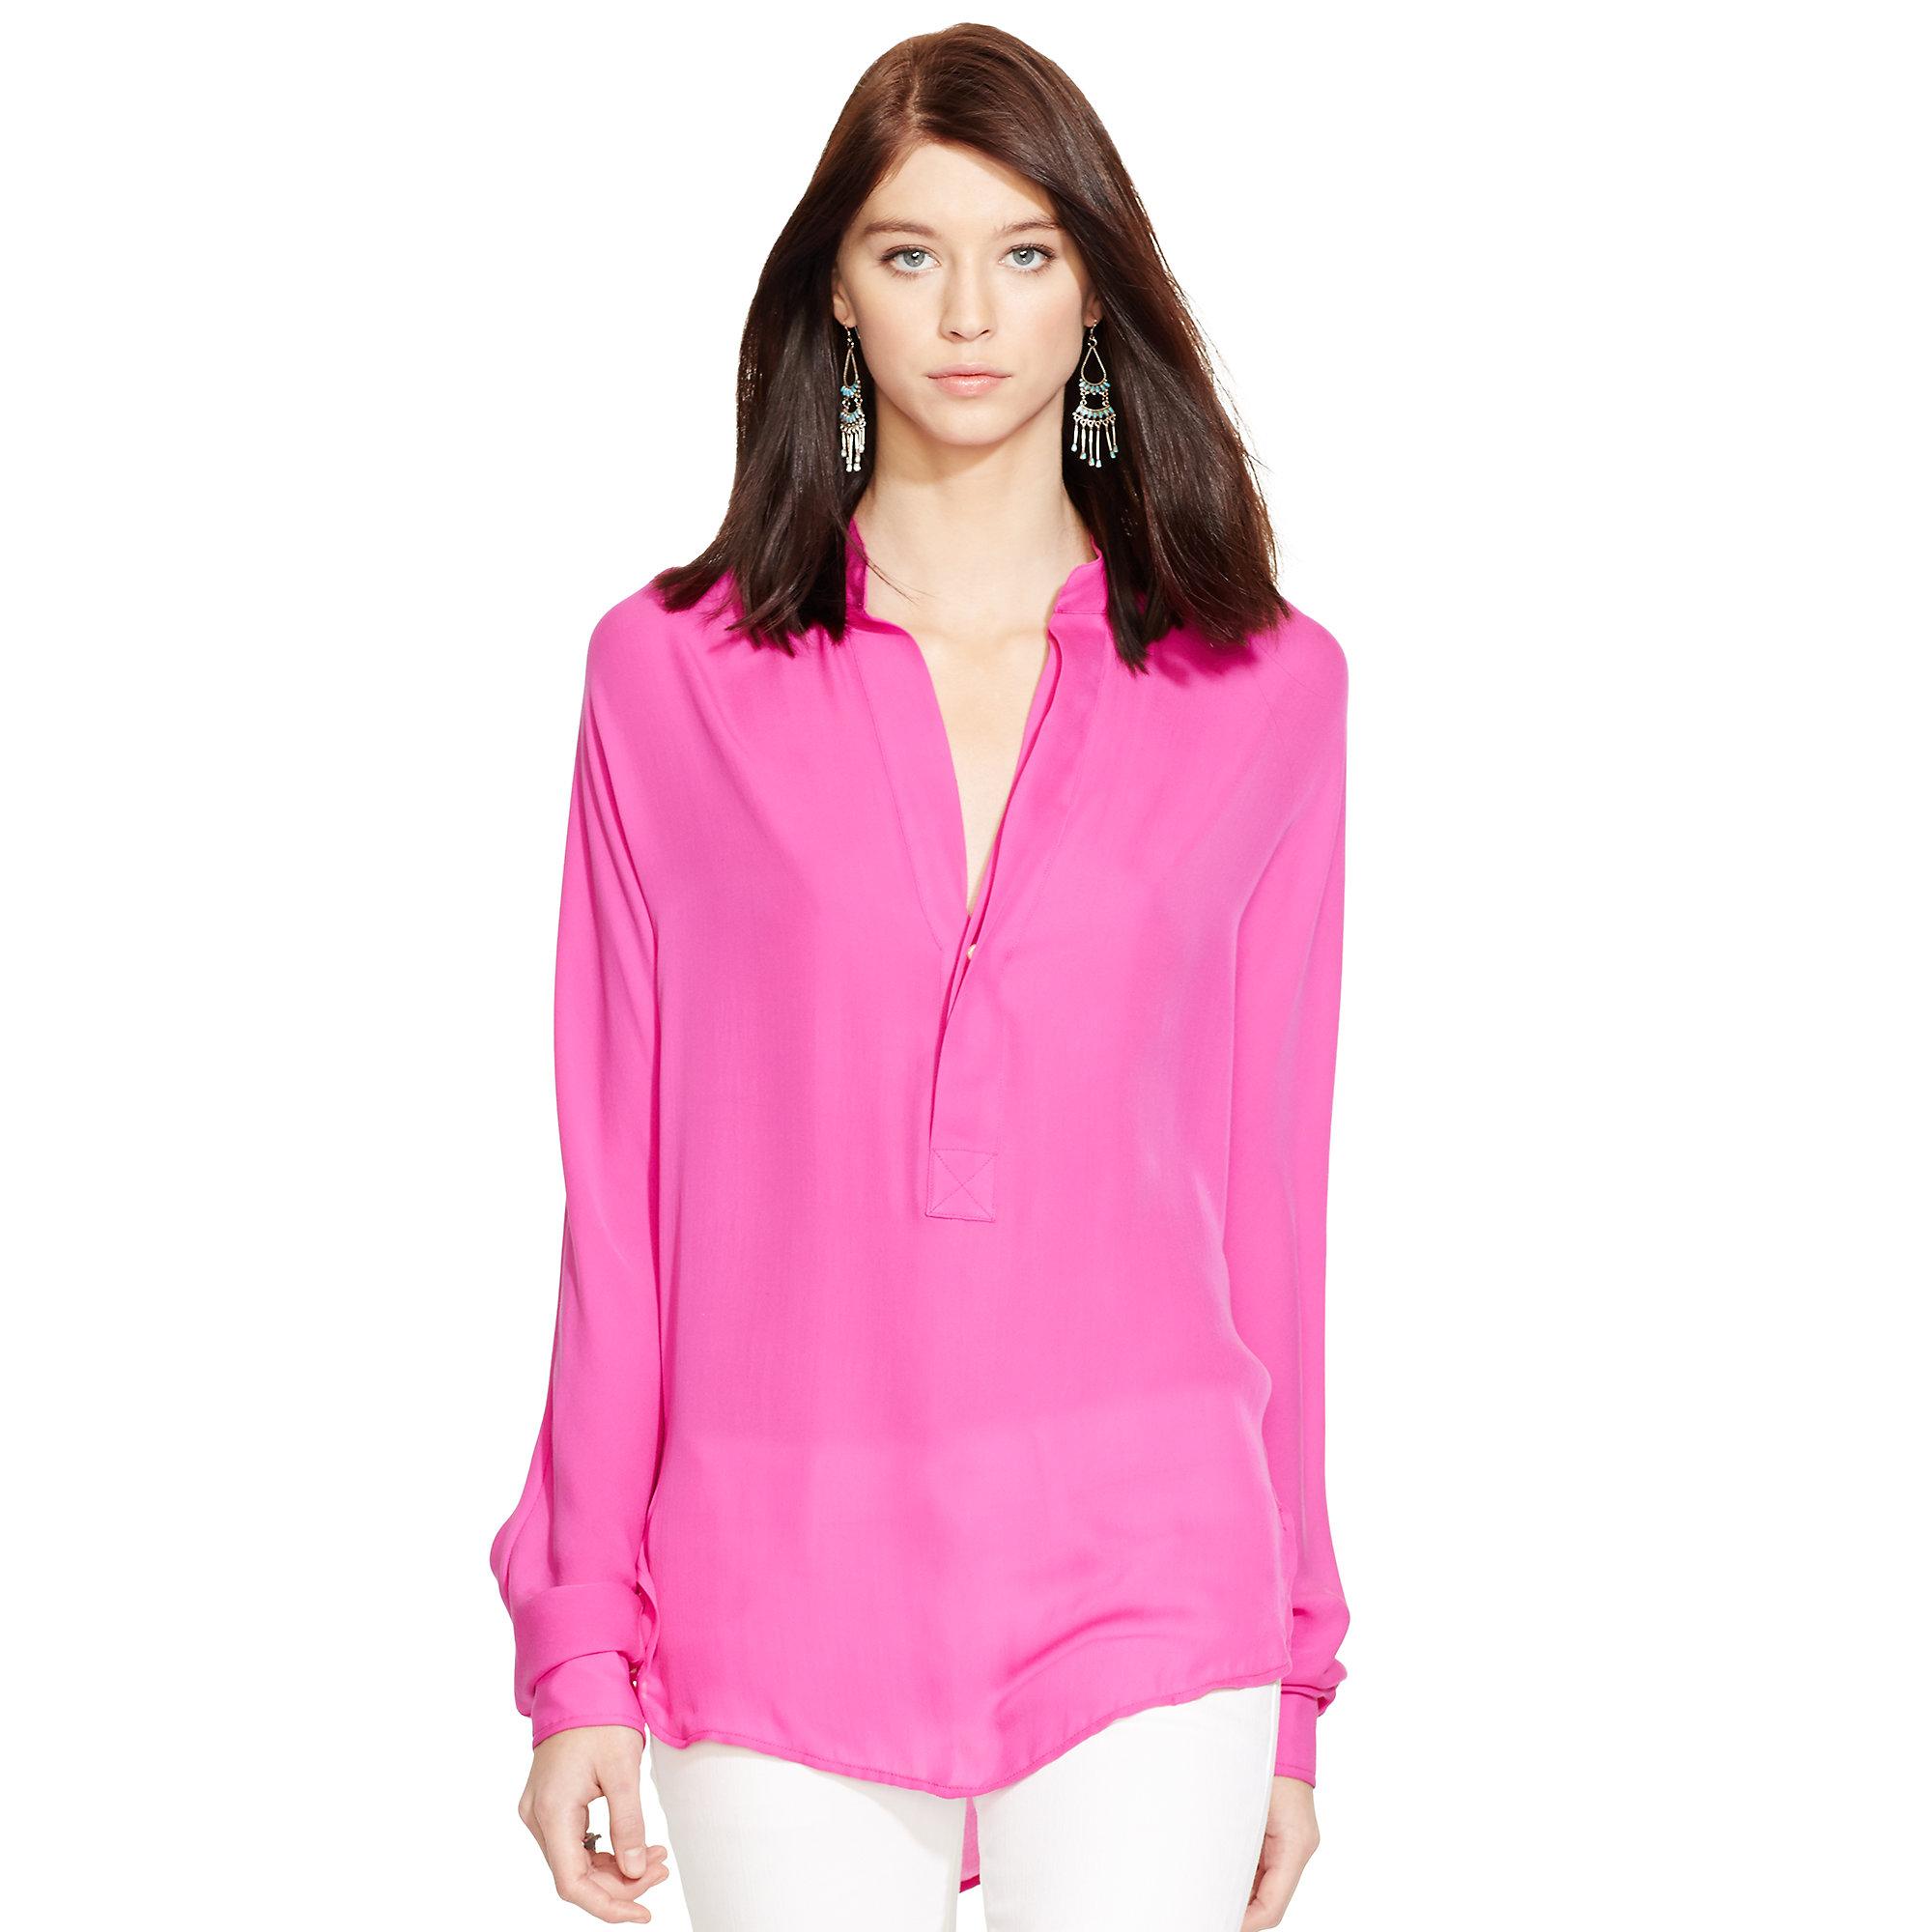 80e46c09f9cb54 Lyst - Polo Ralph Lauren Silk Georgette Blouse in Pink